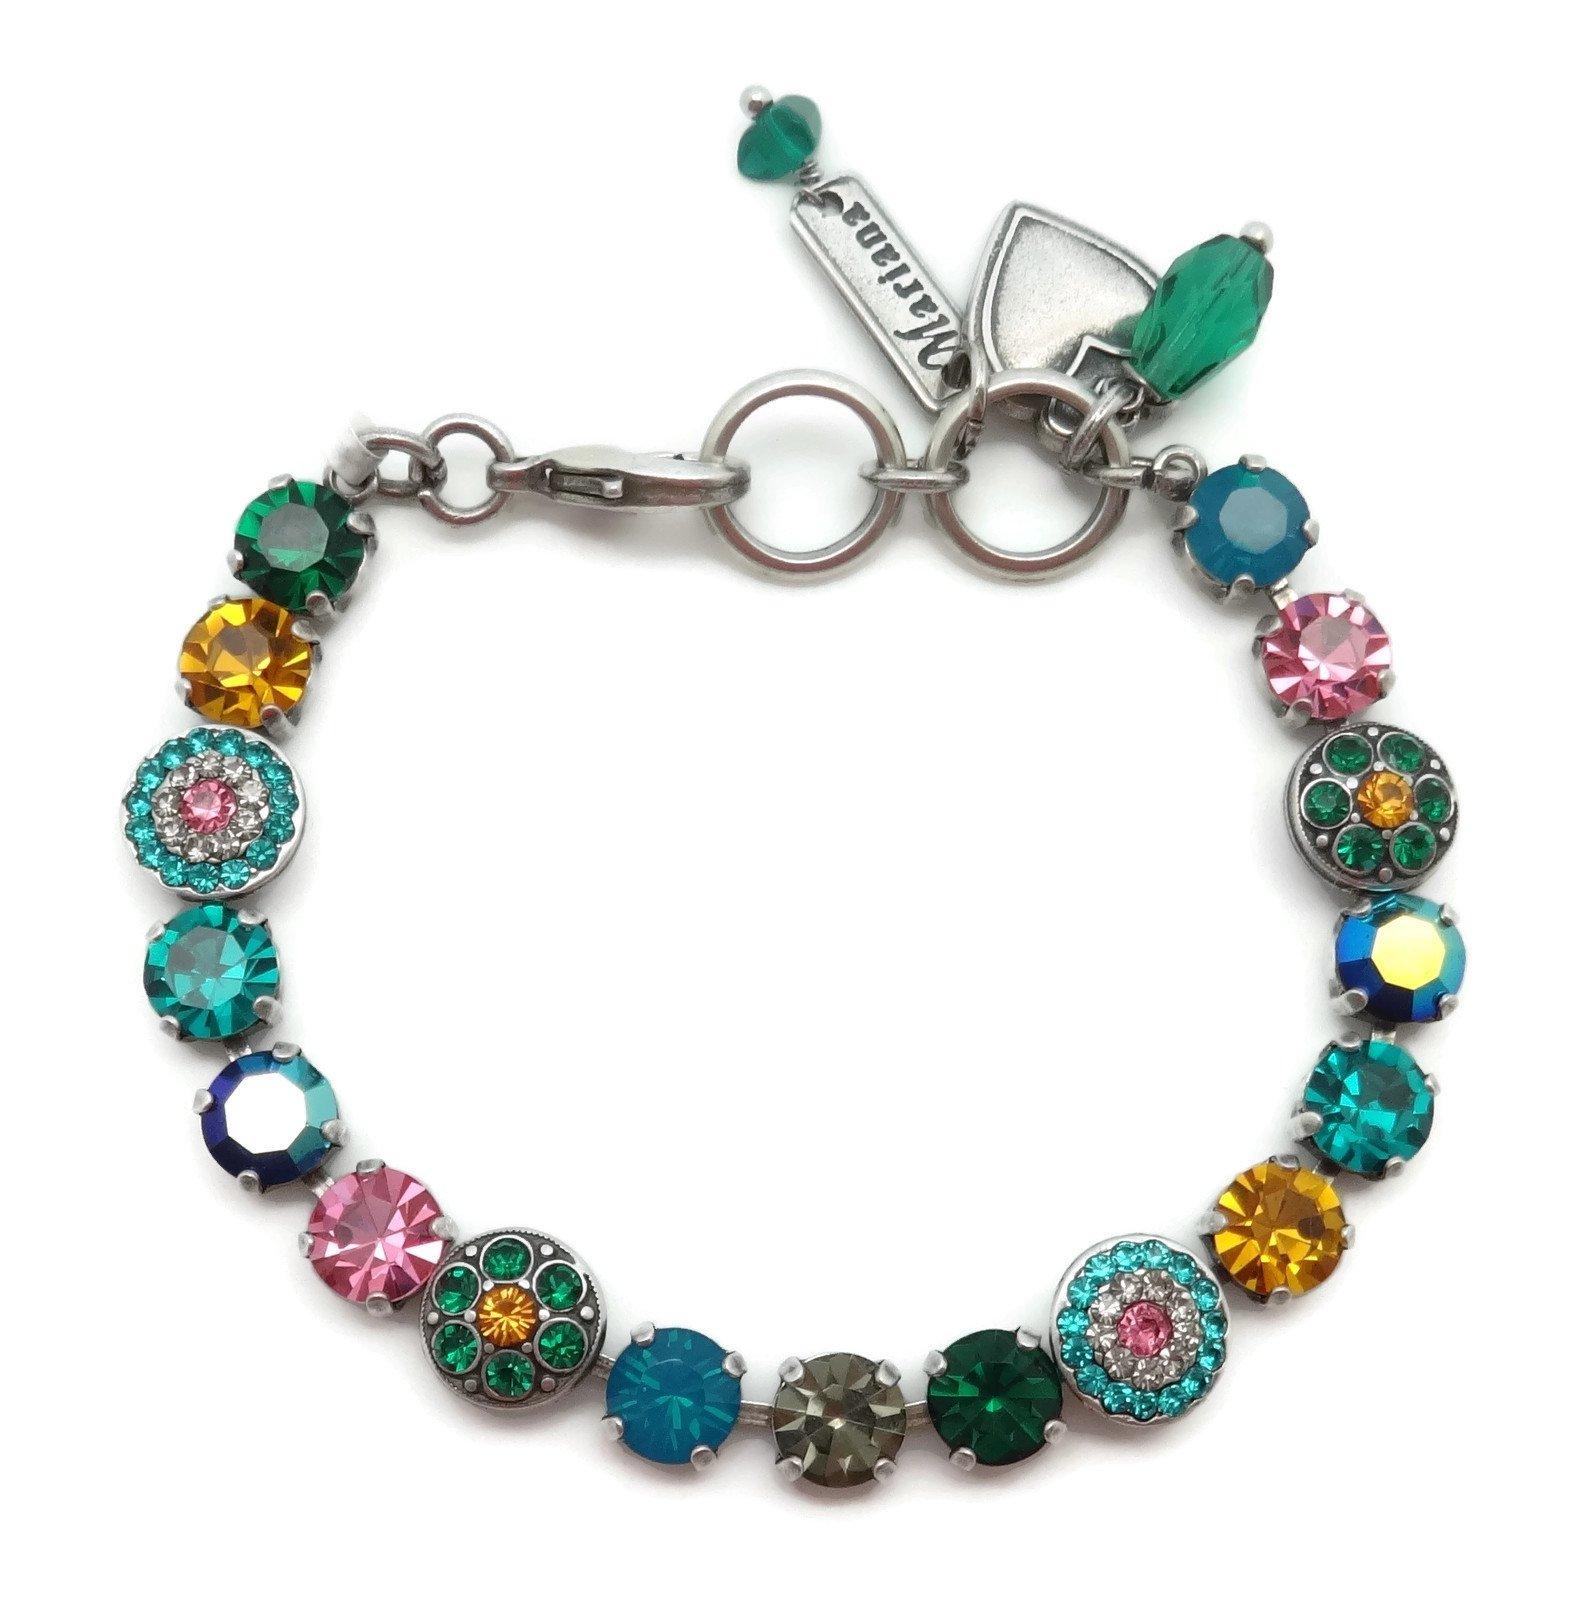 Mariana Silver Plated Swarovski Crystal Bracelet Green & Pink Mix Mosaic 1086 Selene